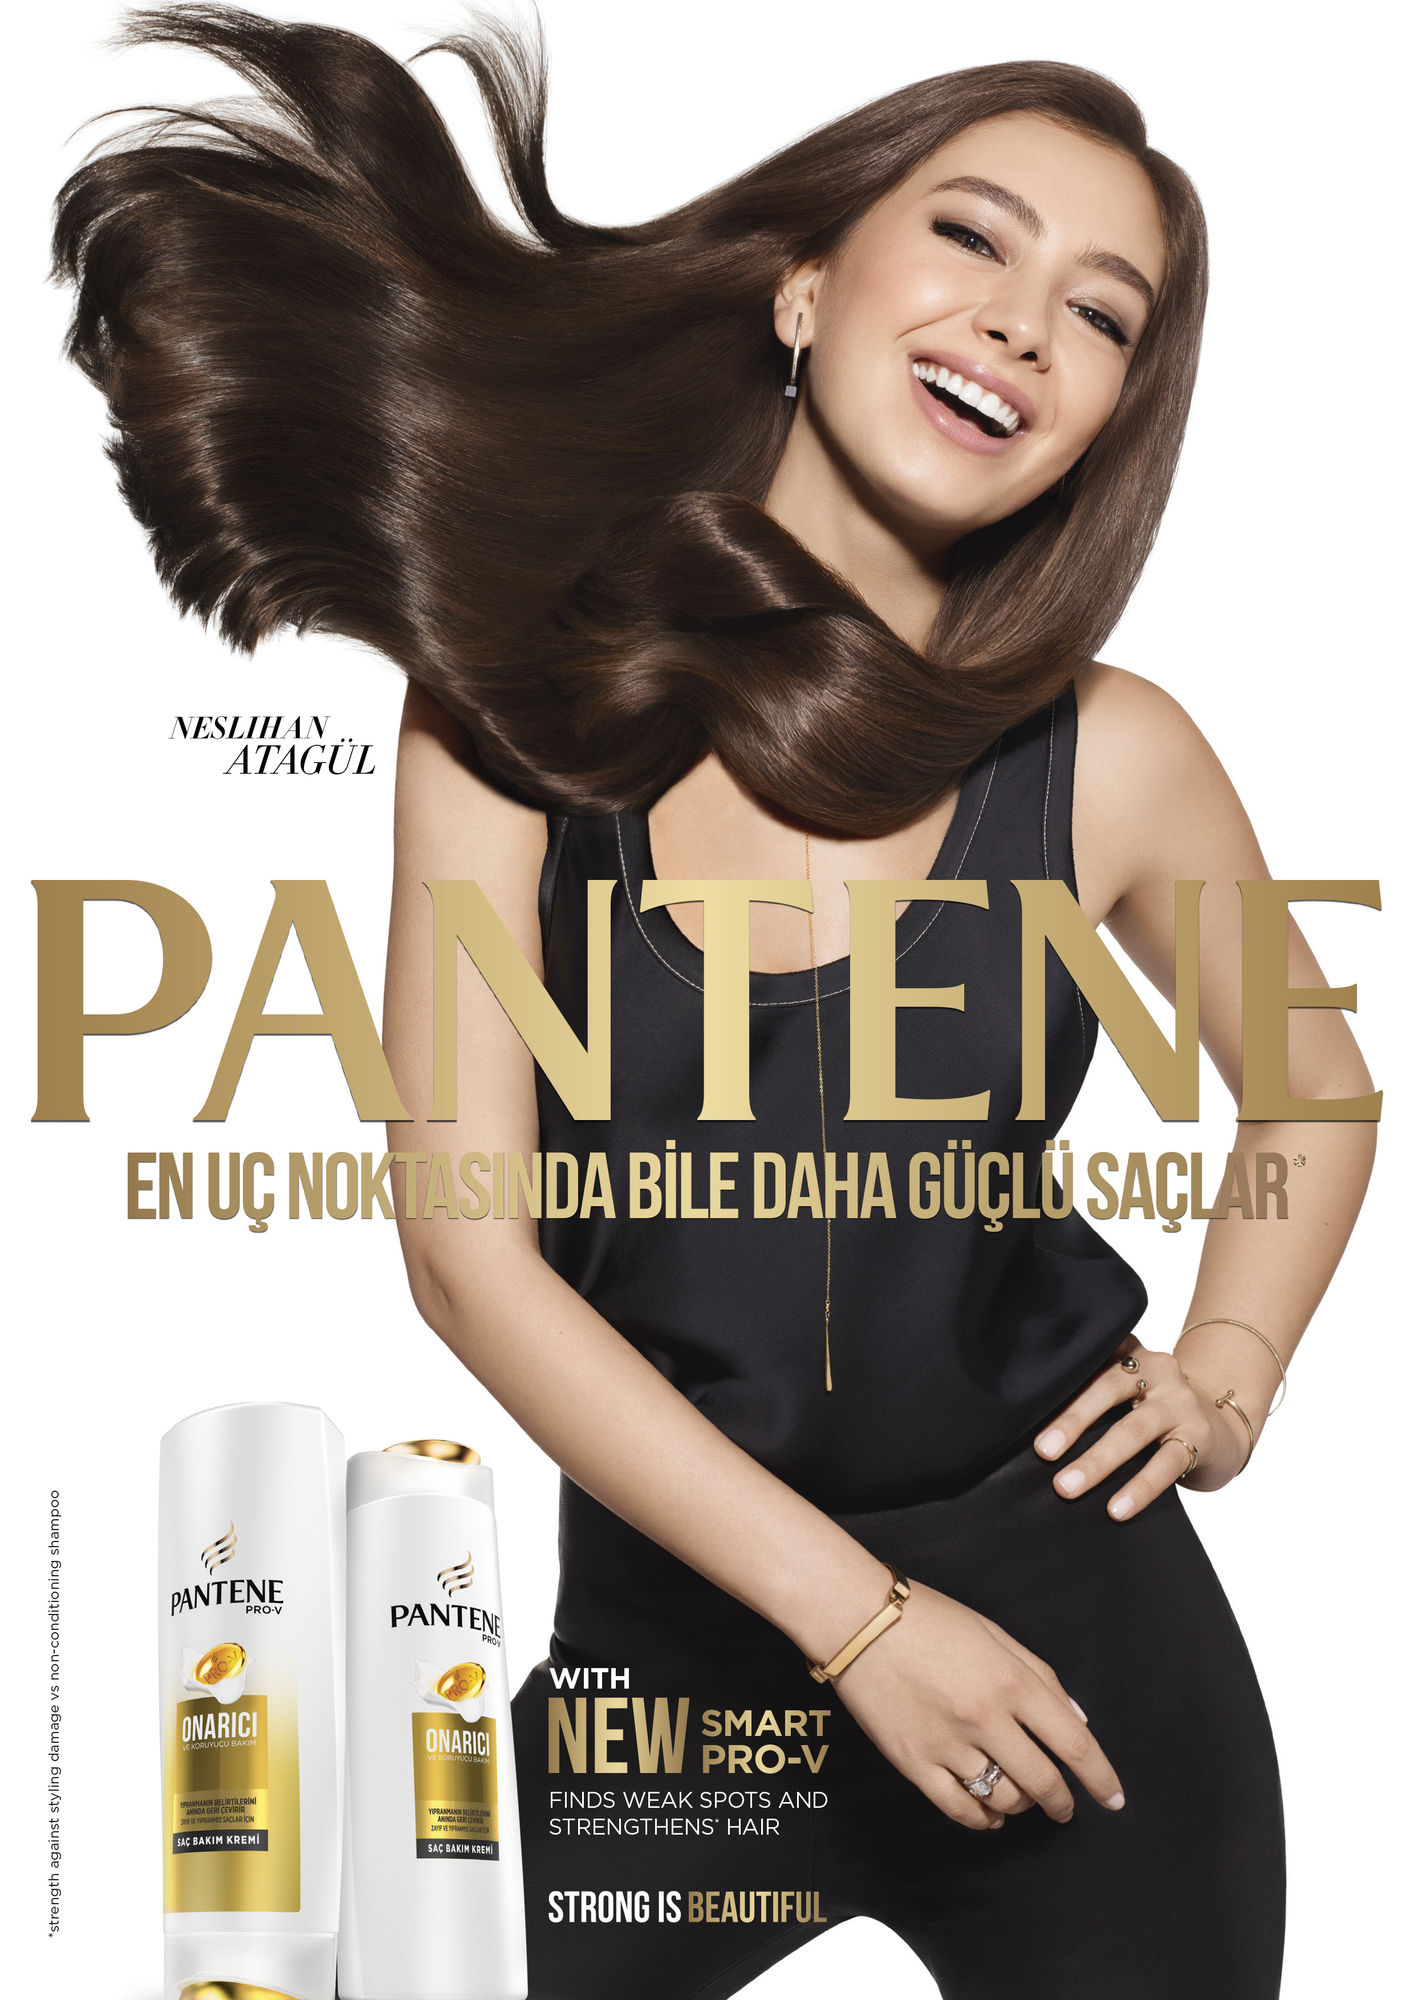 Pantene   European Campaign